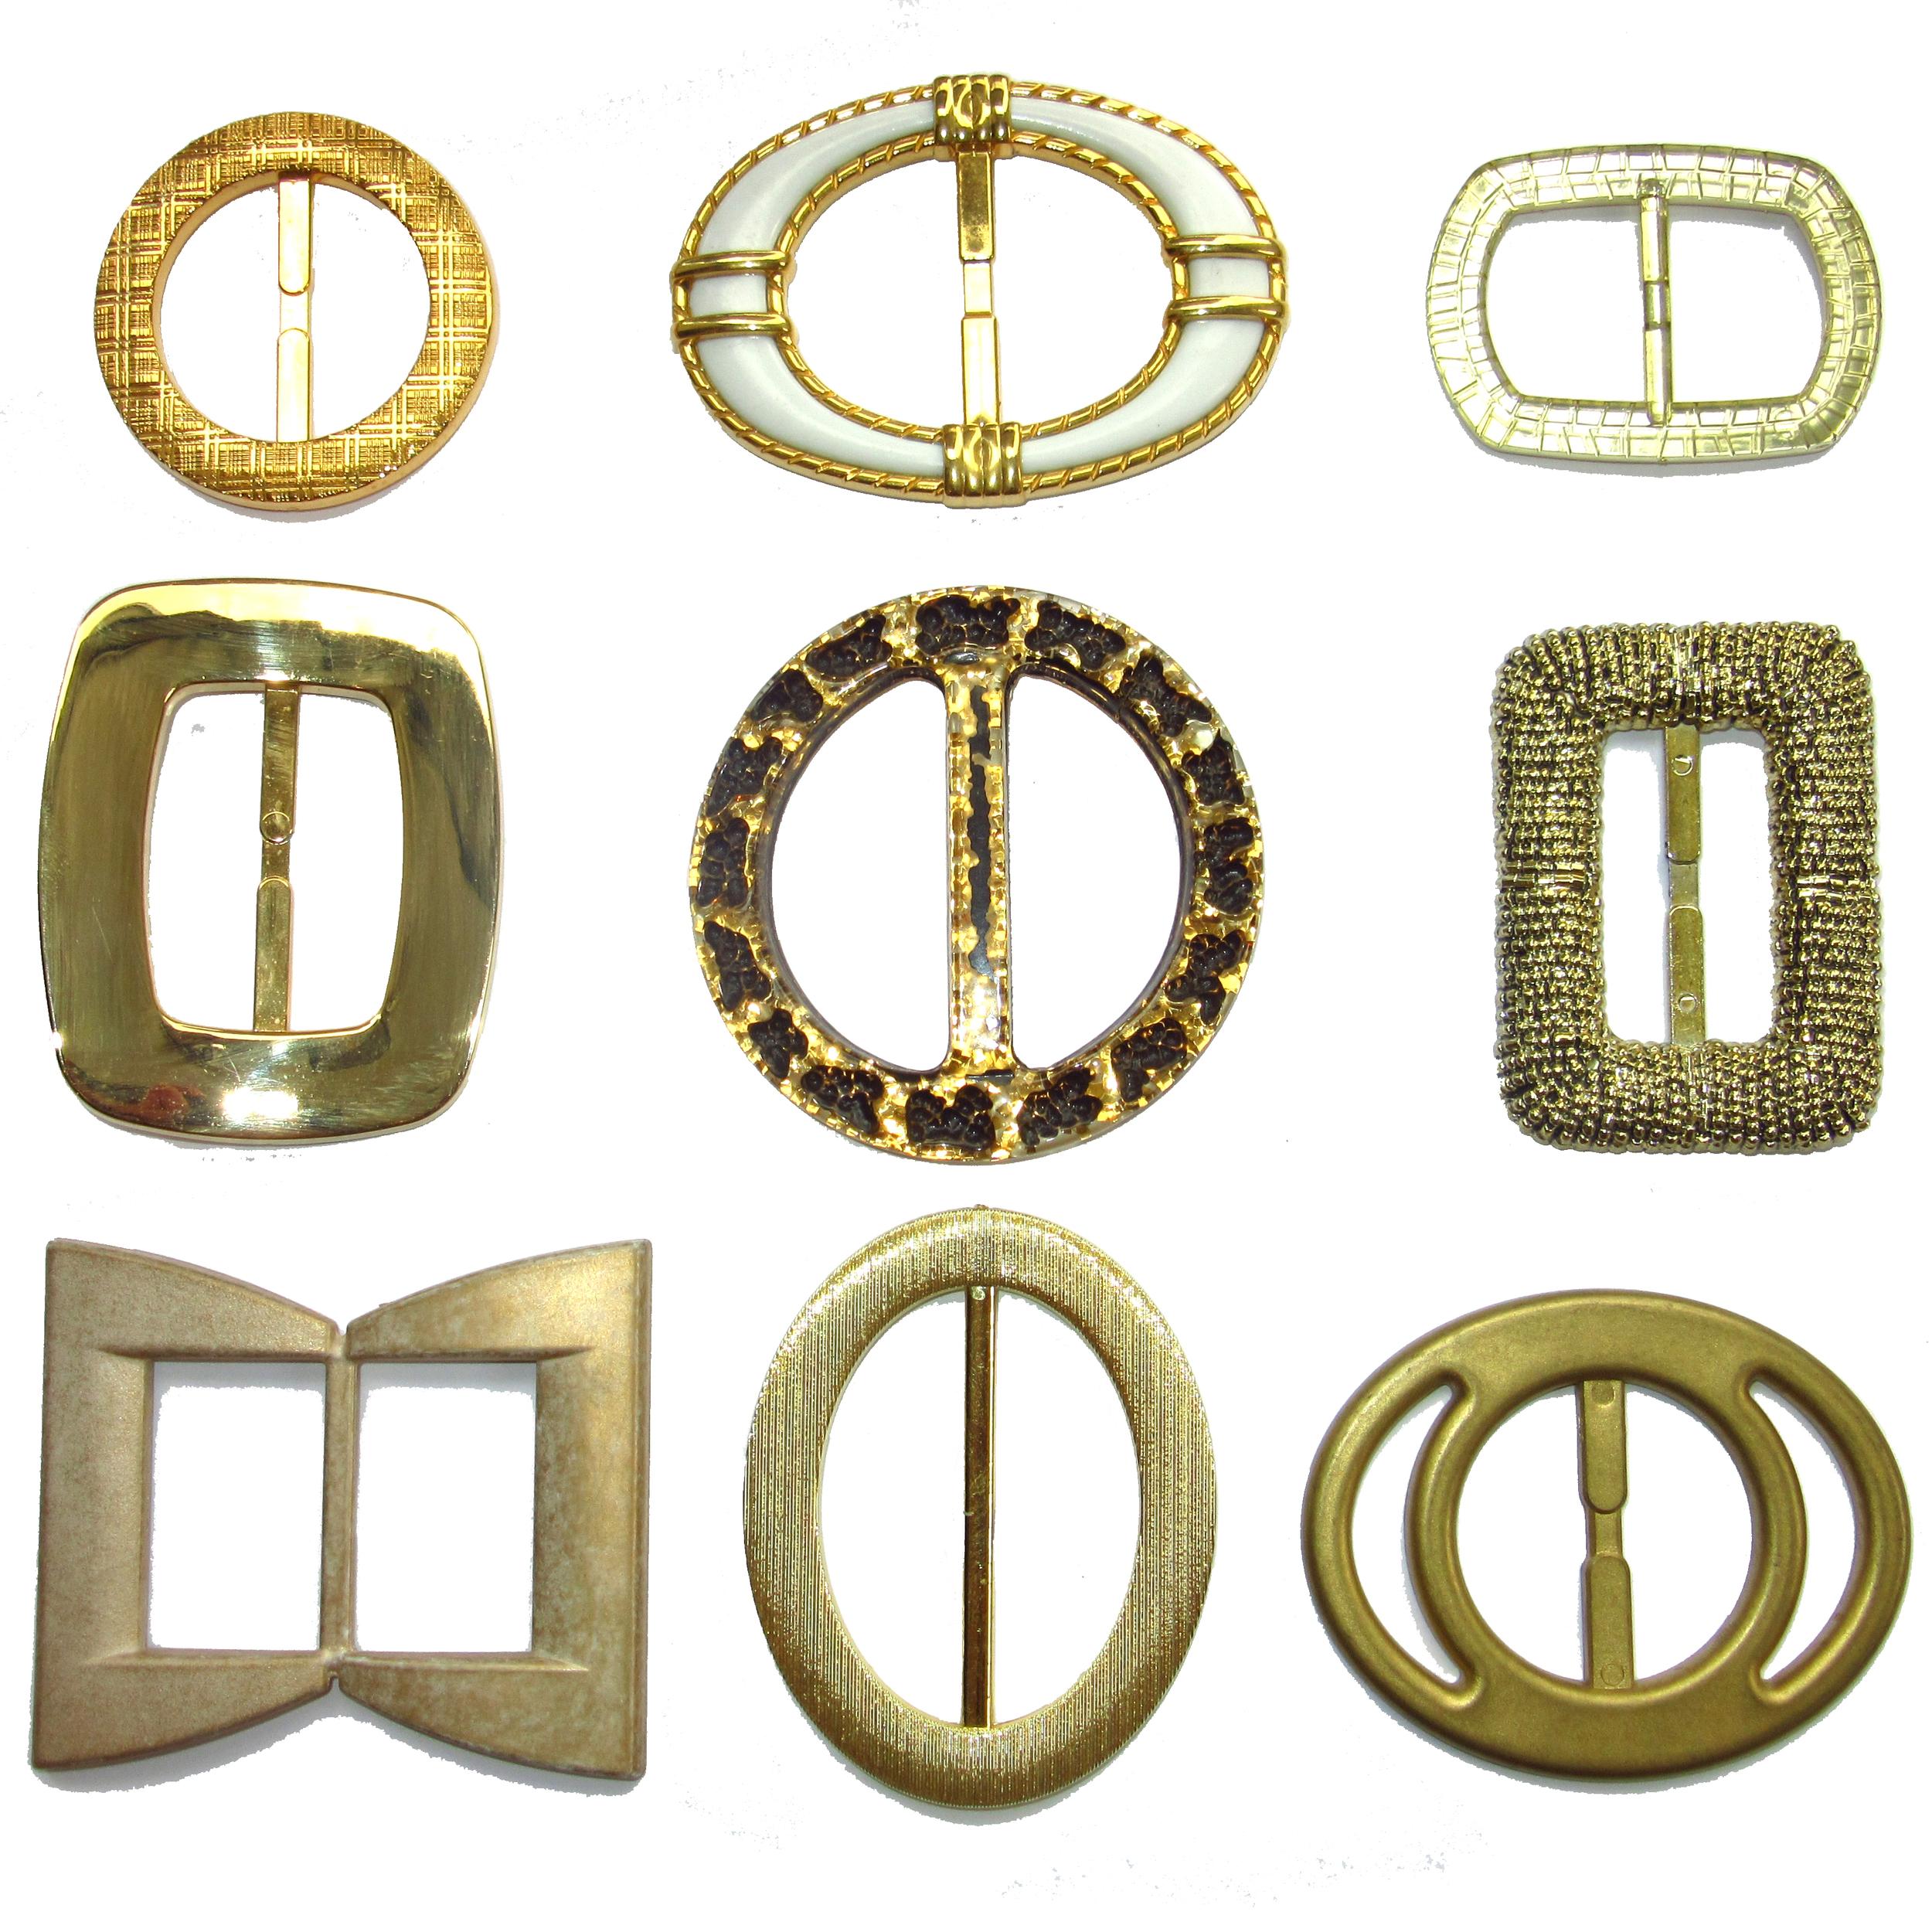 Gold plastic belt buckles